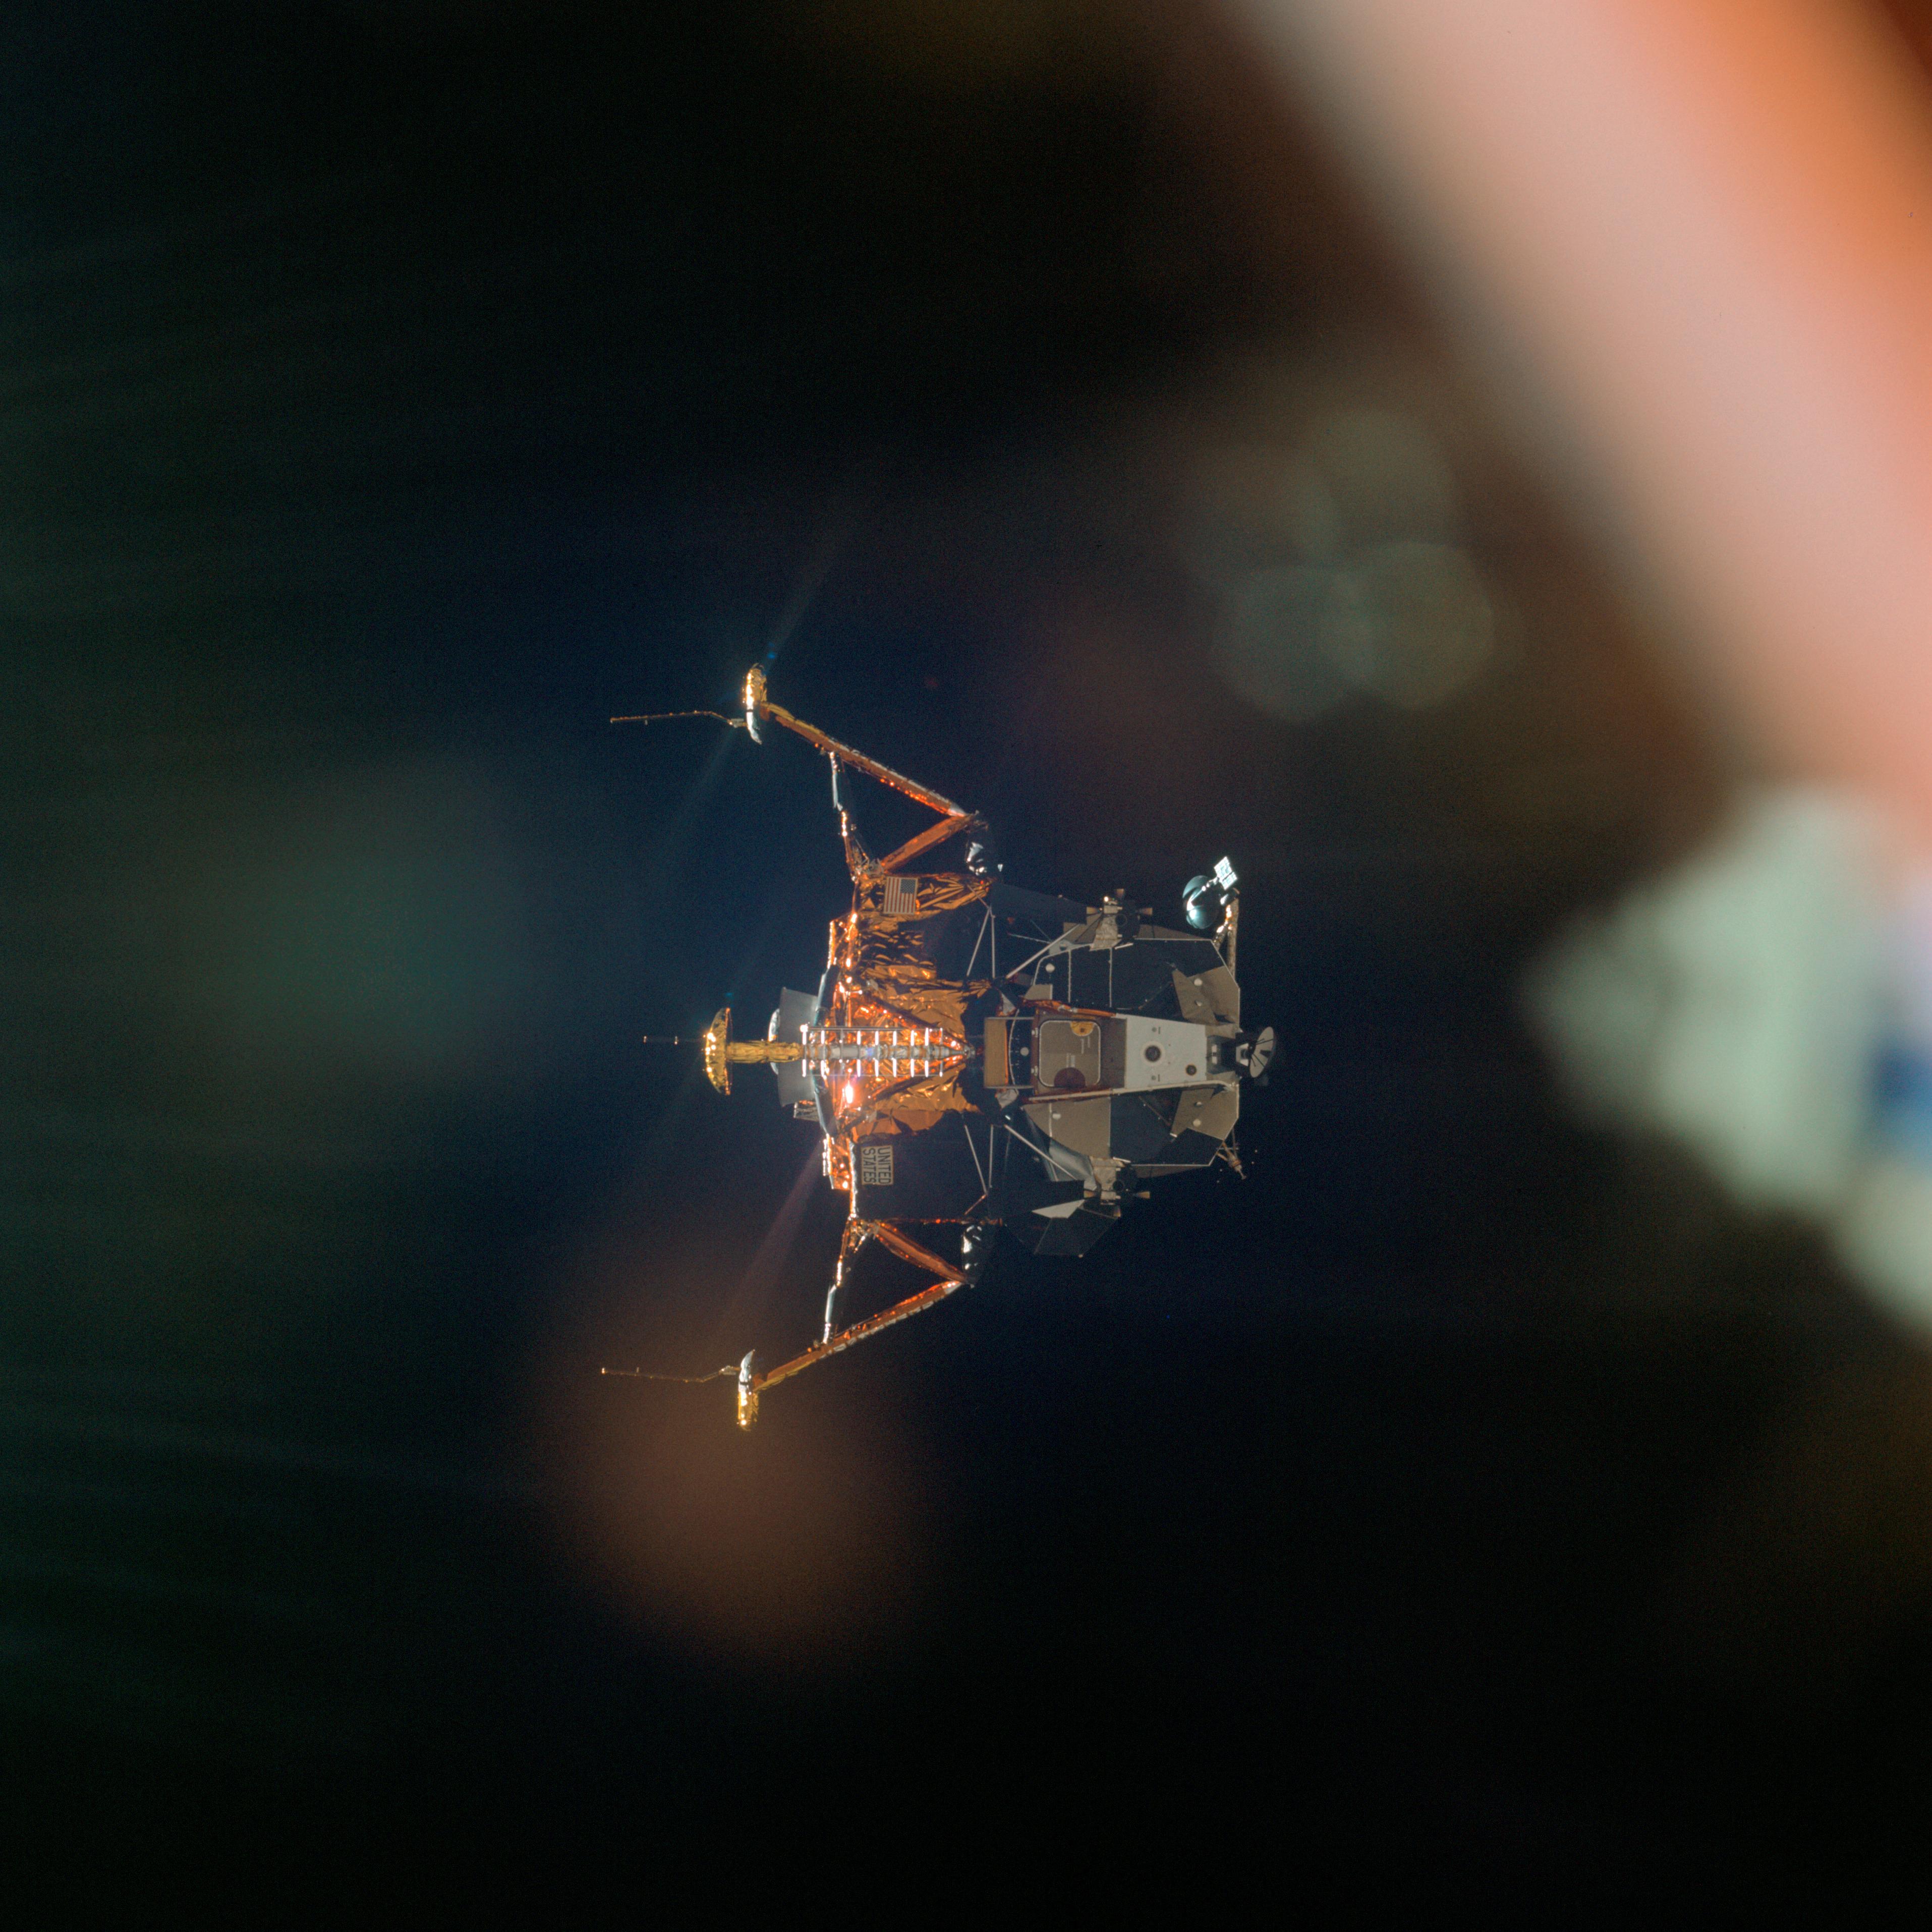 Apollo_11_Eagle